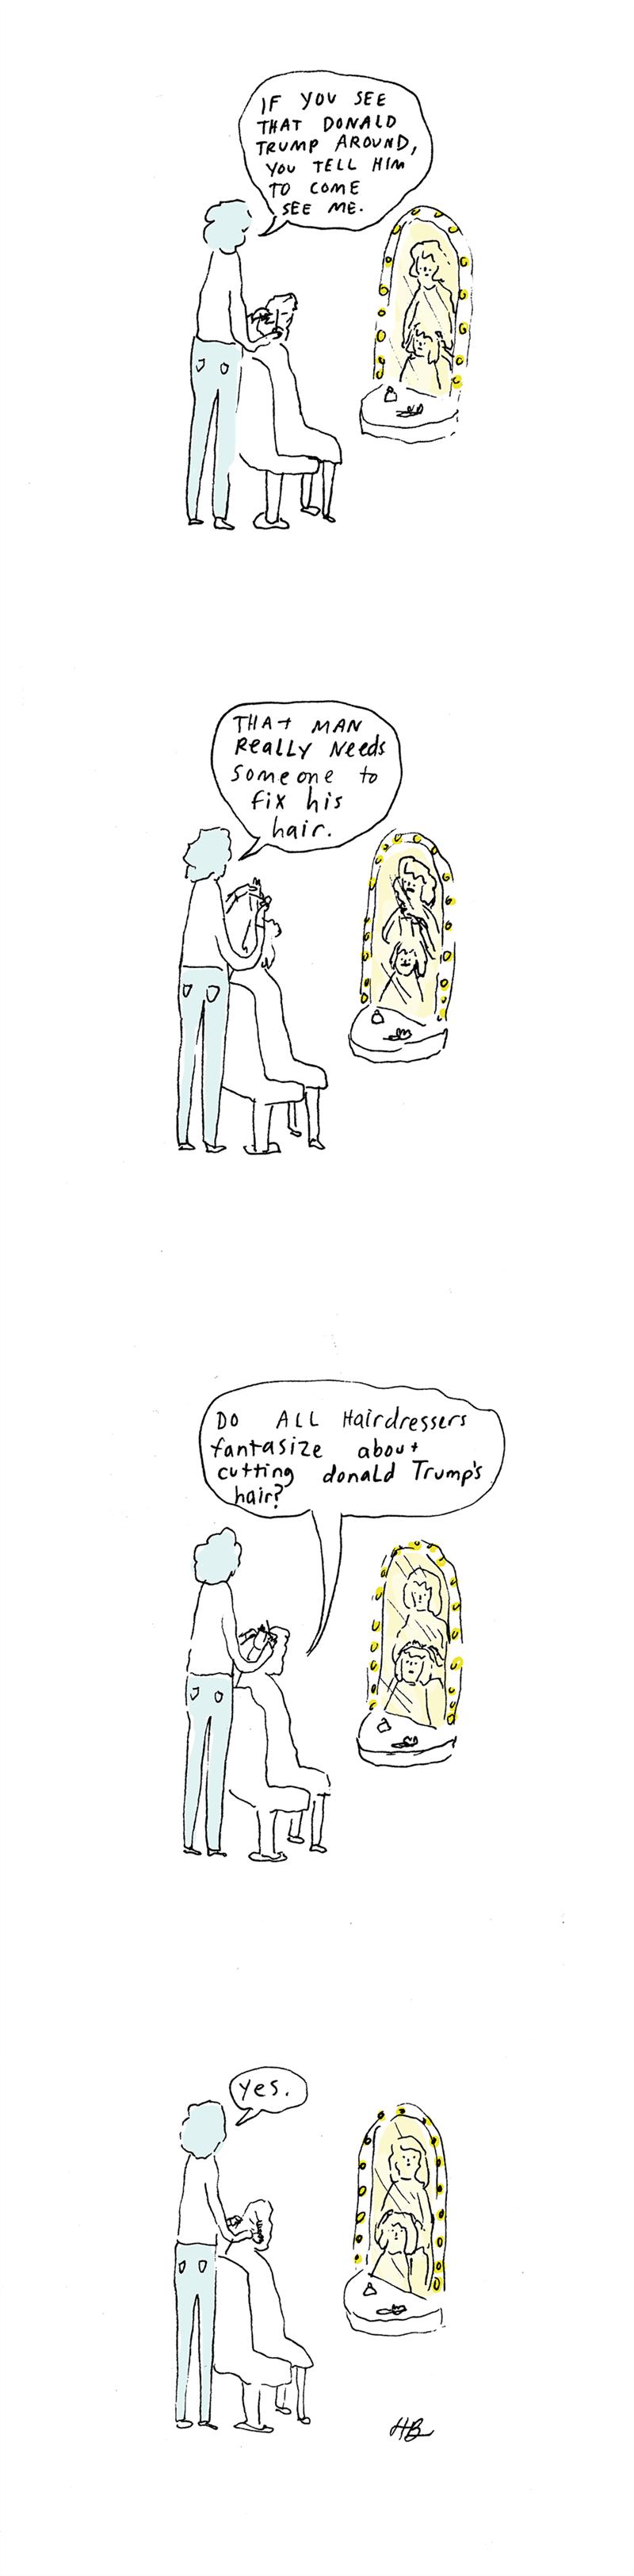 funny-web-comics-donald-trump-solicits-fantasies-for-some